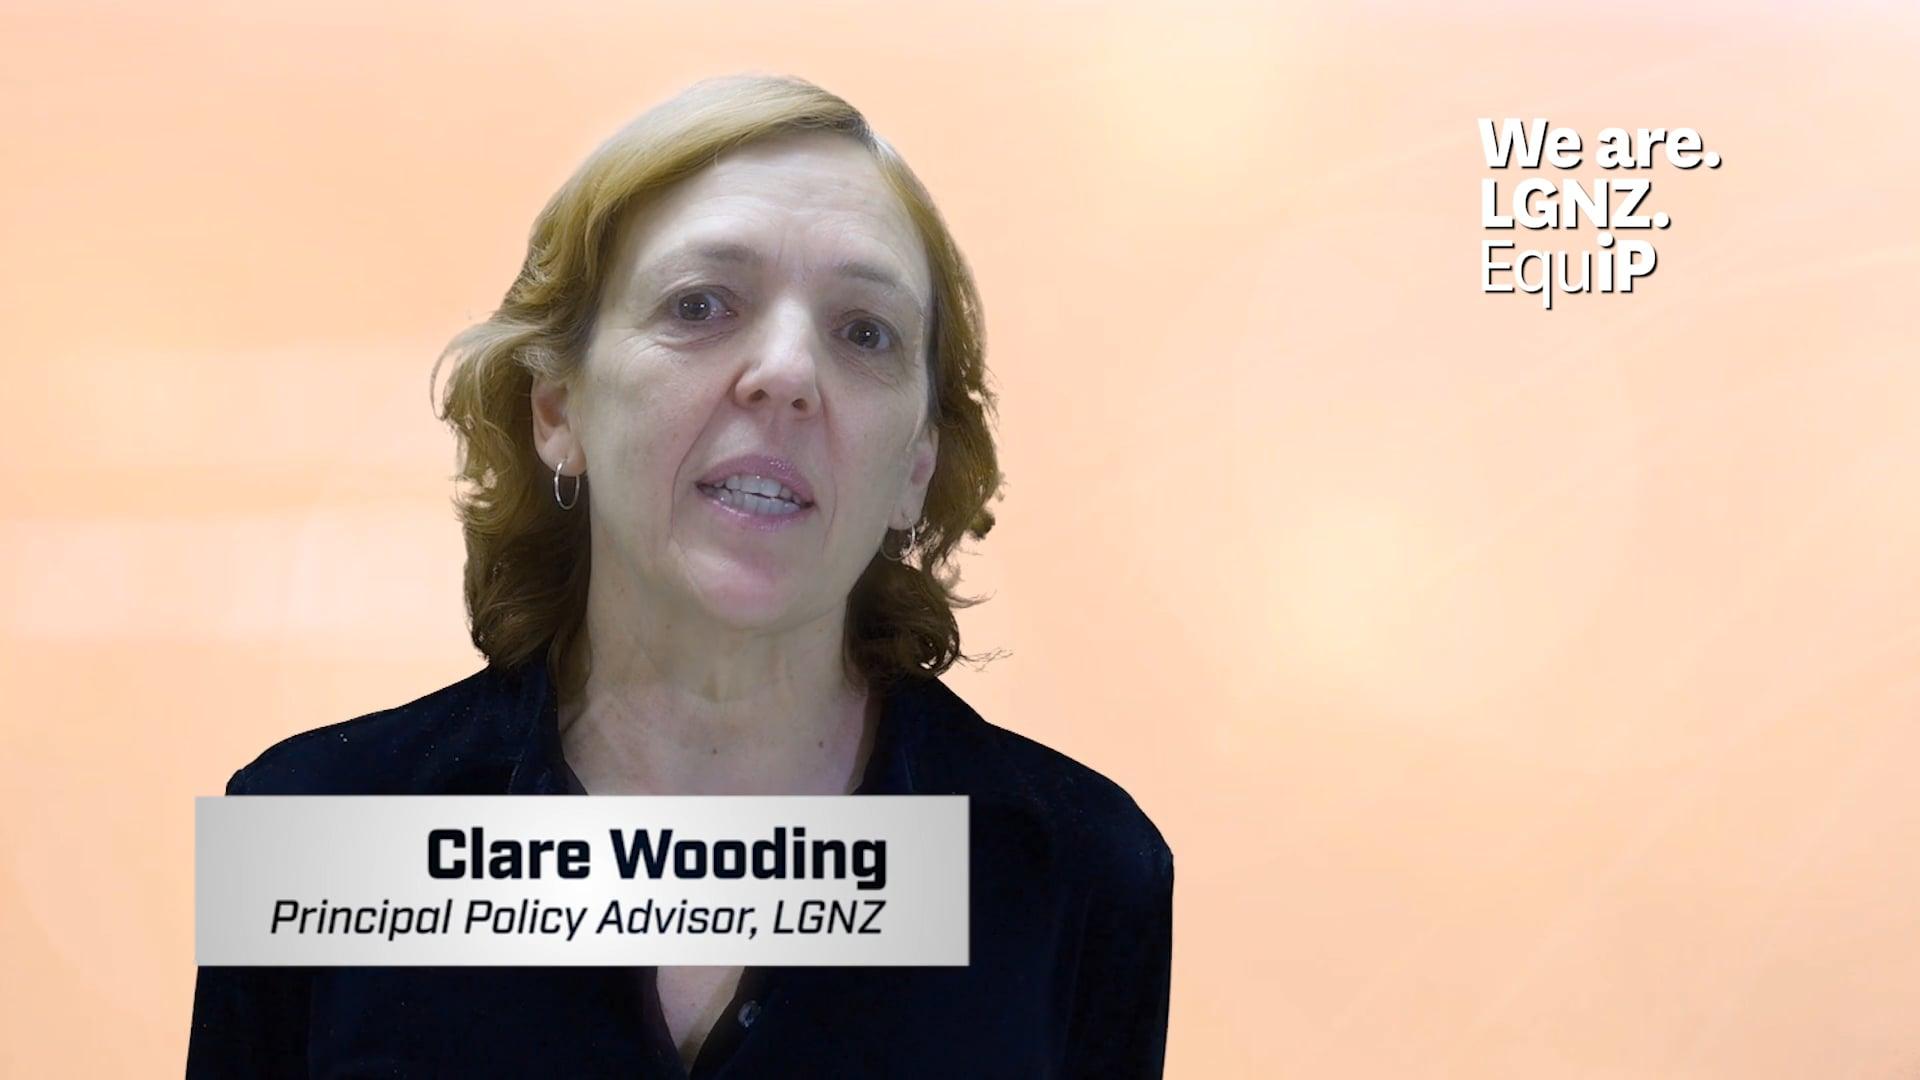 Clare Wooding, Principal Policy Advisor, LGNZ